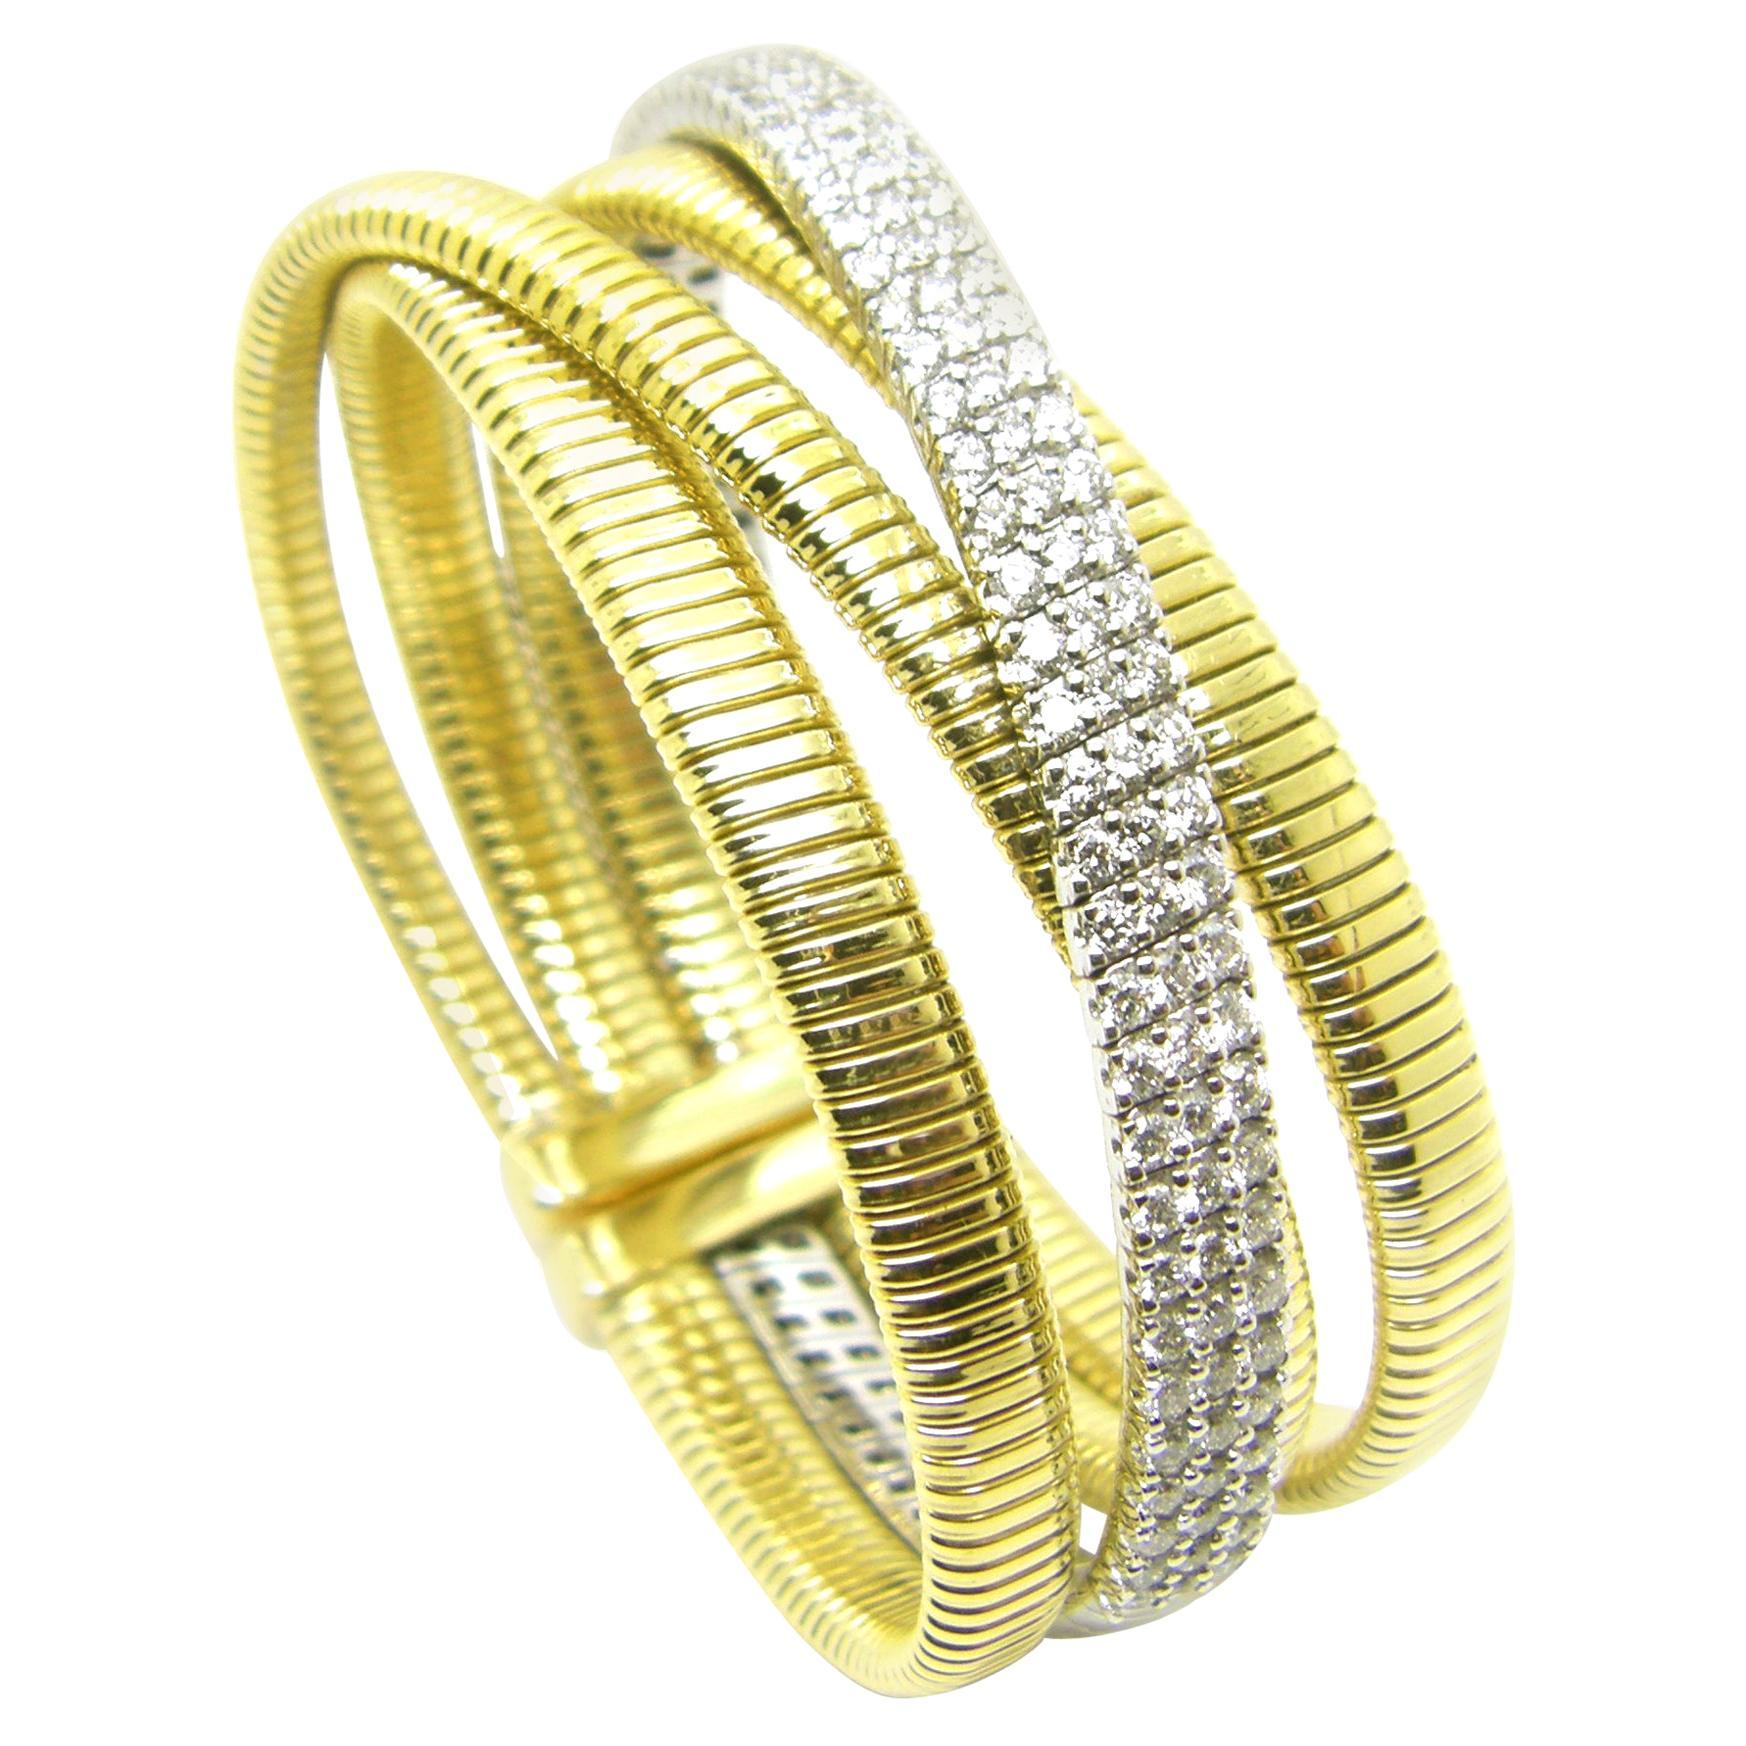 Georgios Collections 18 Karat White and Yellow Gold Diamond Cuff Bangle Bracelet